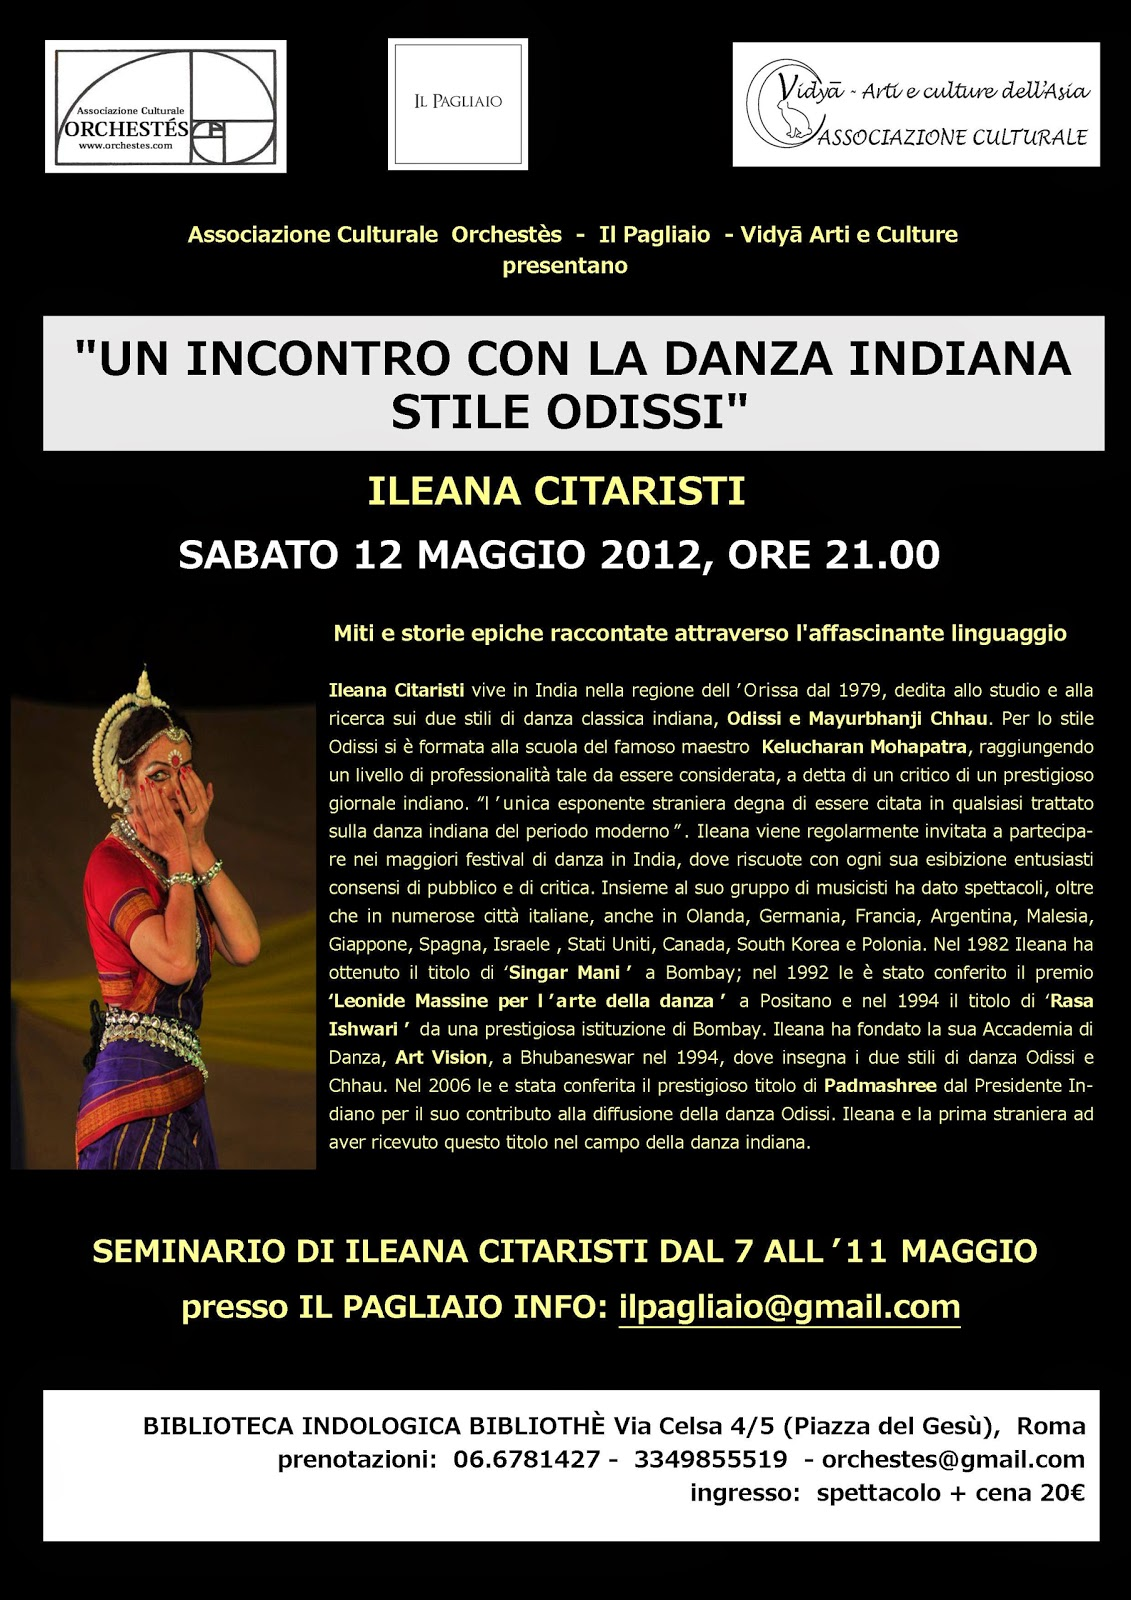 Danza Odissi a Roma Ileana Citaristi